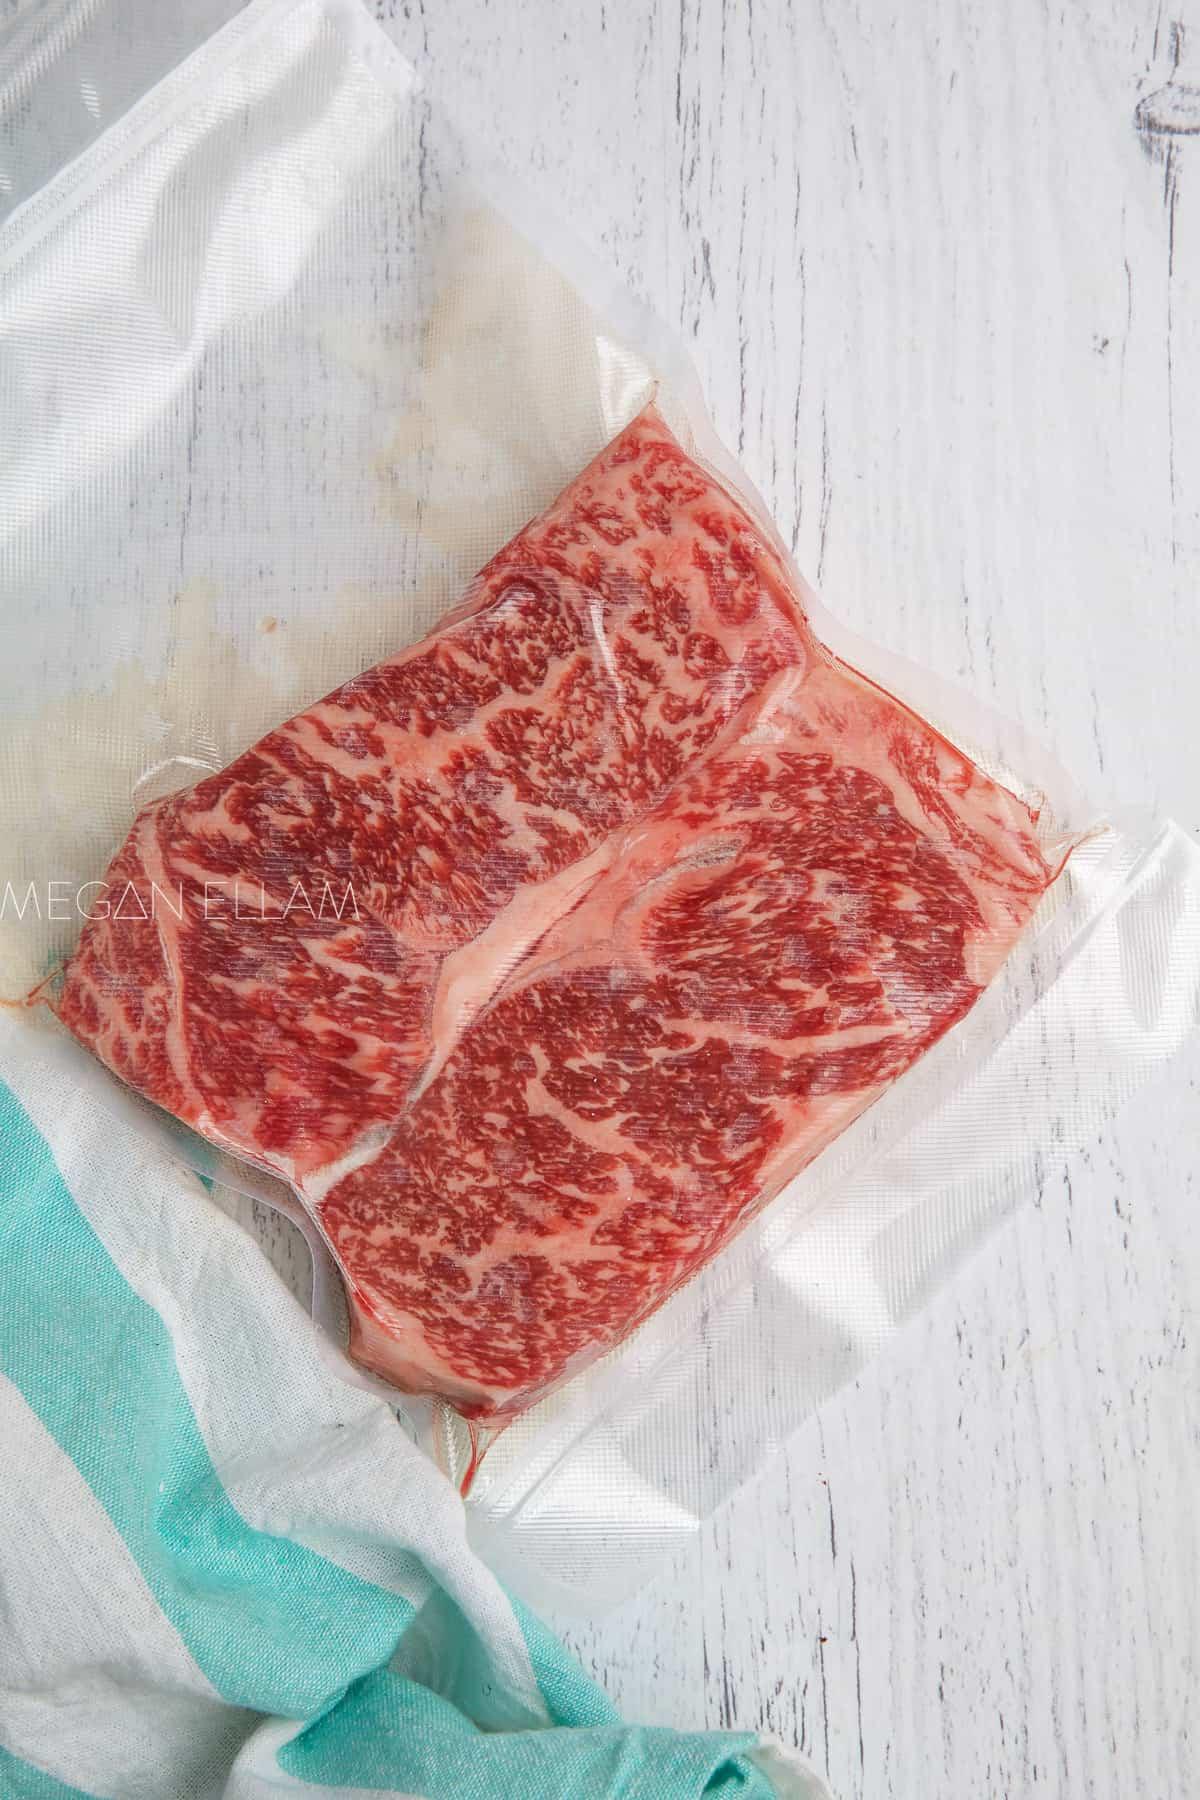 wagyu steak in a sous vide bag.